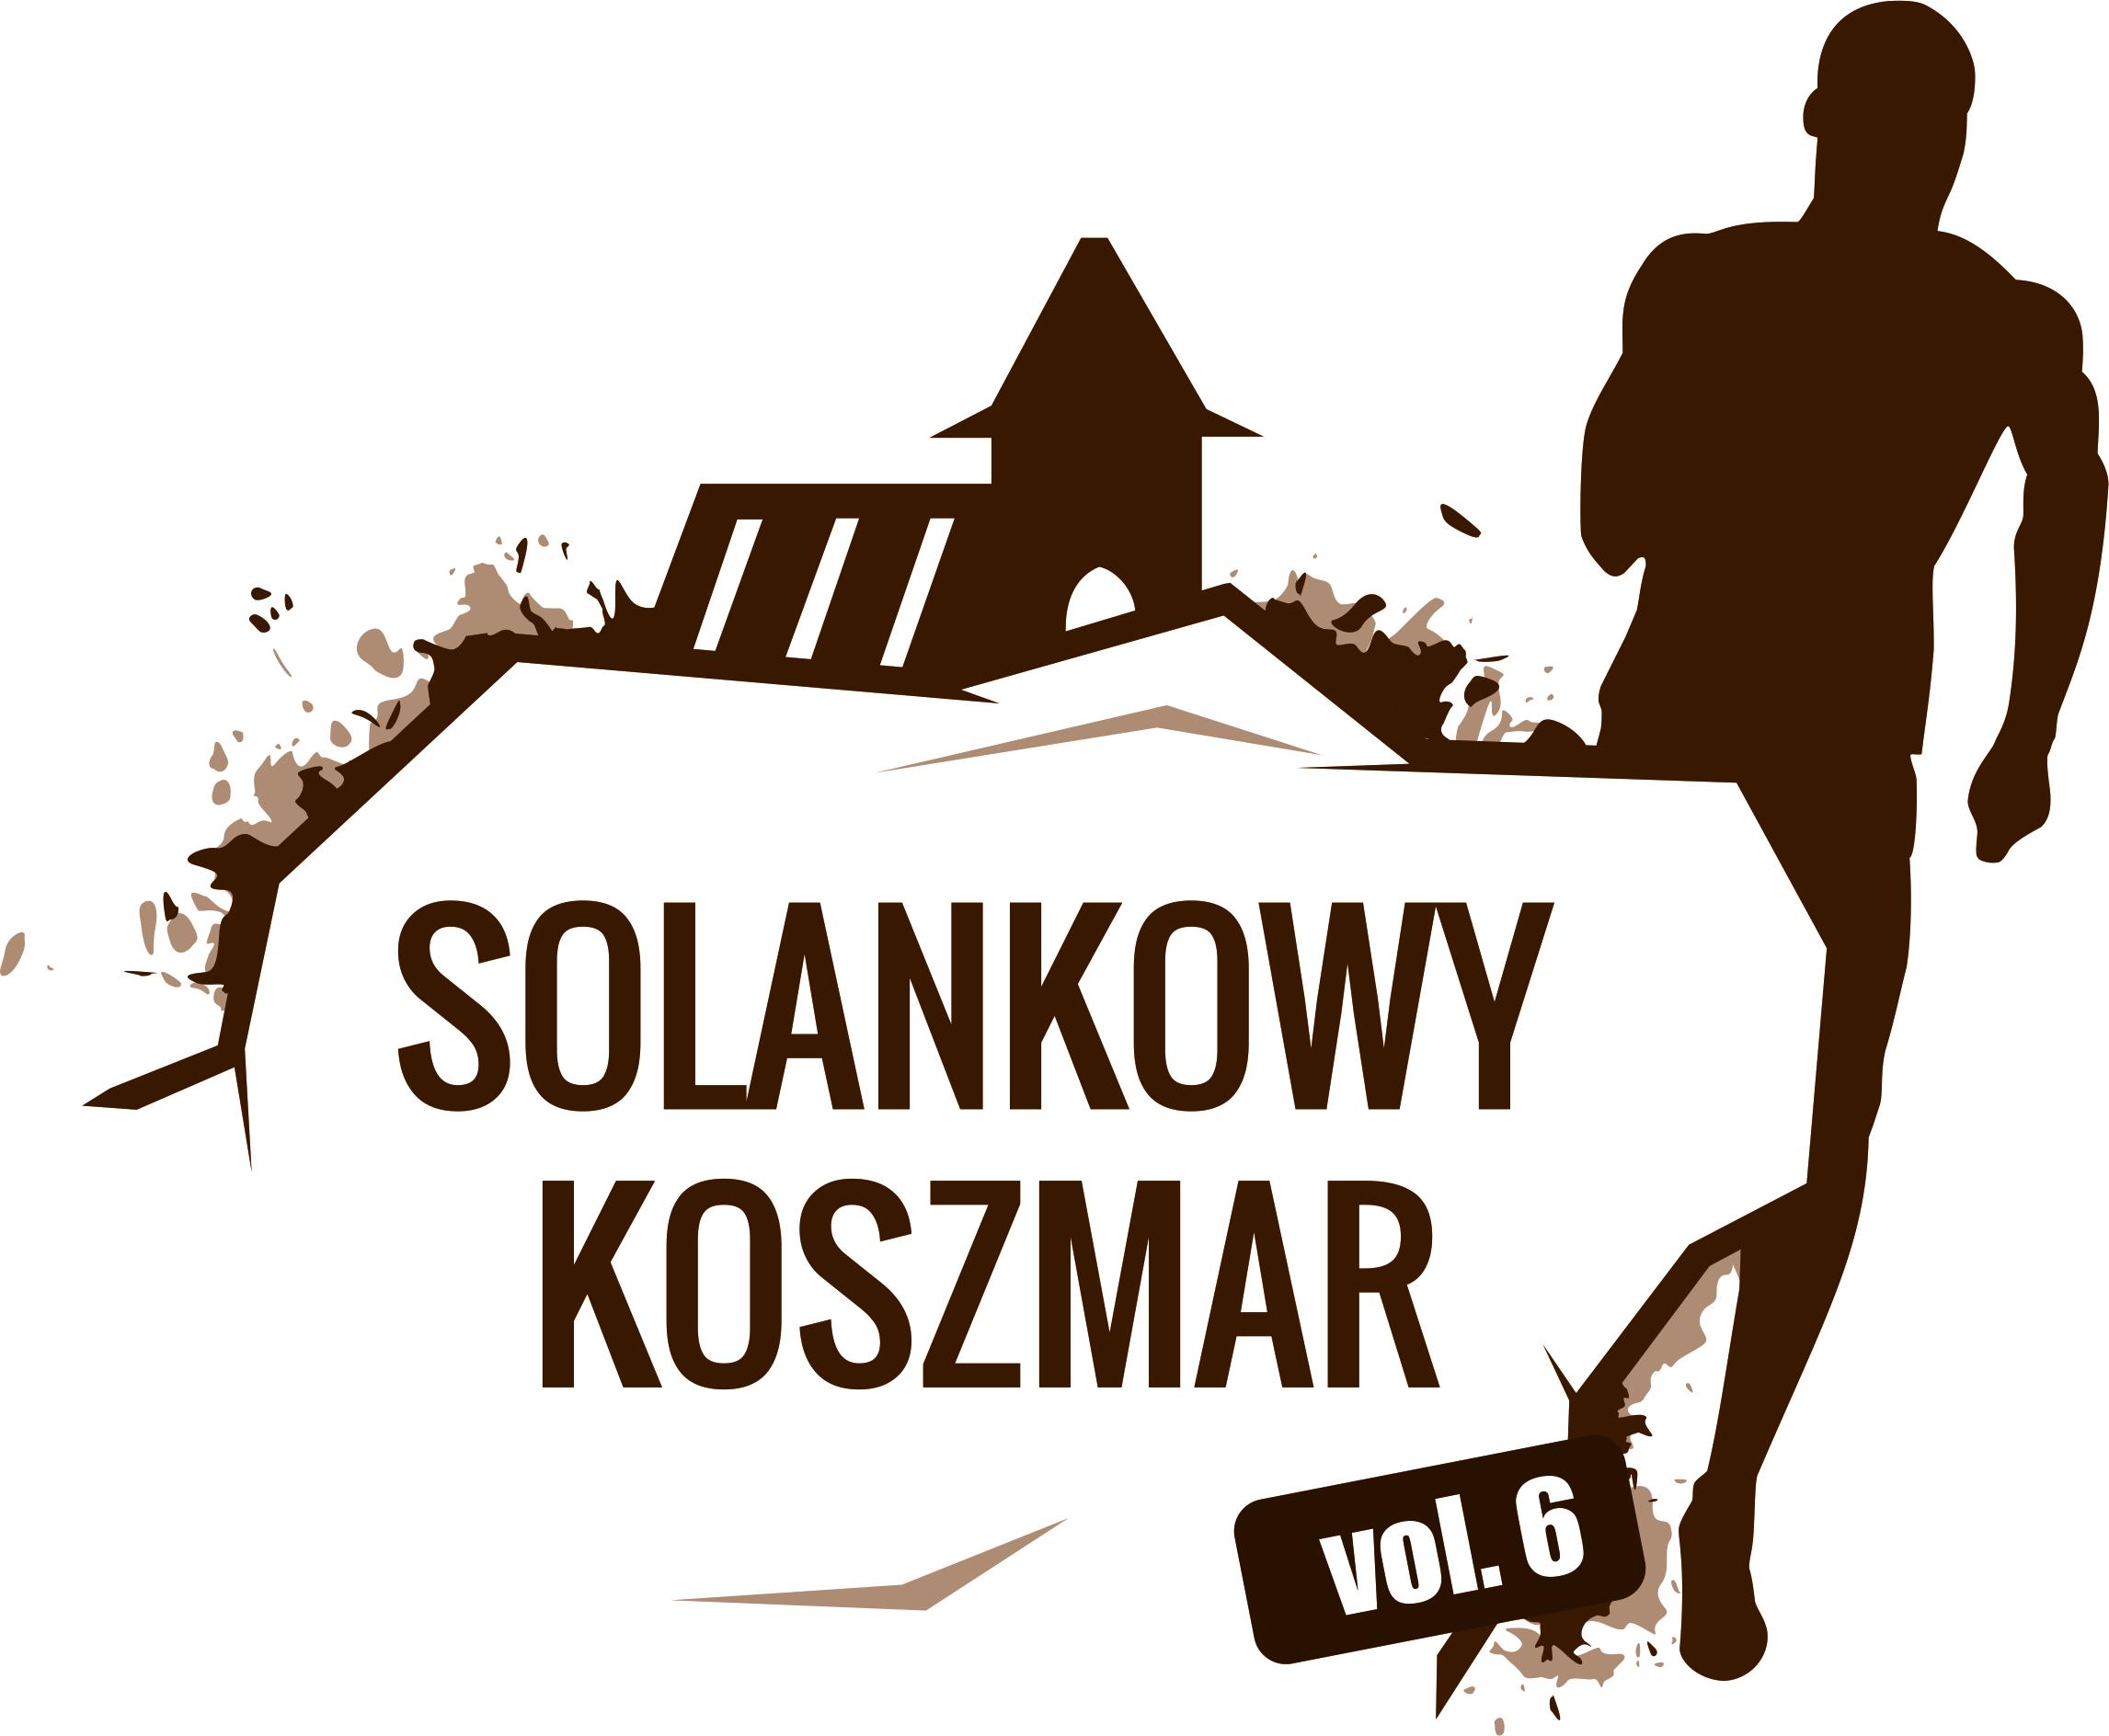 Logo Solankowy Koszmar vol.6